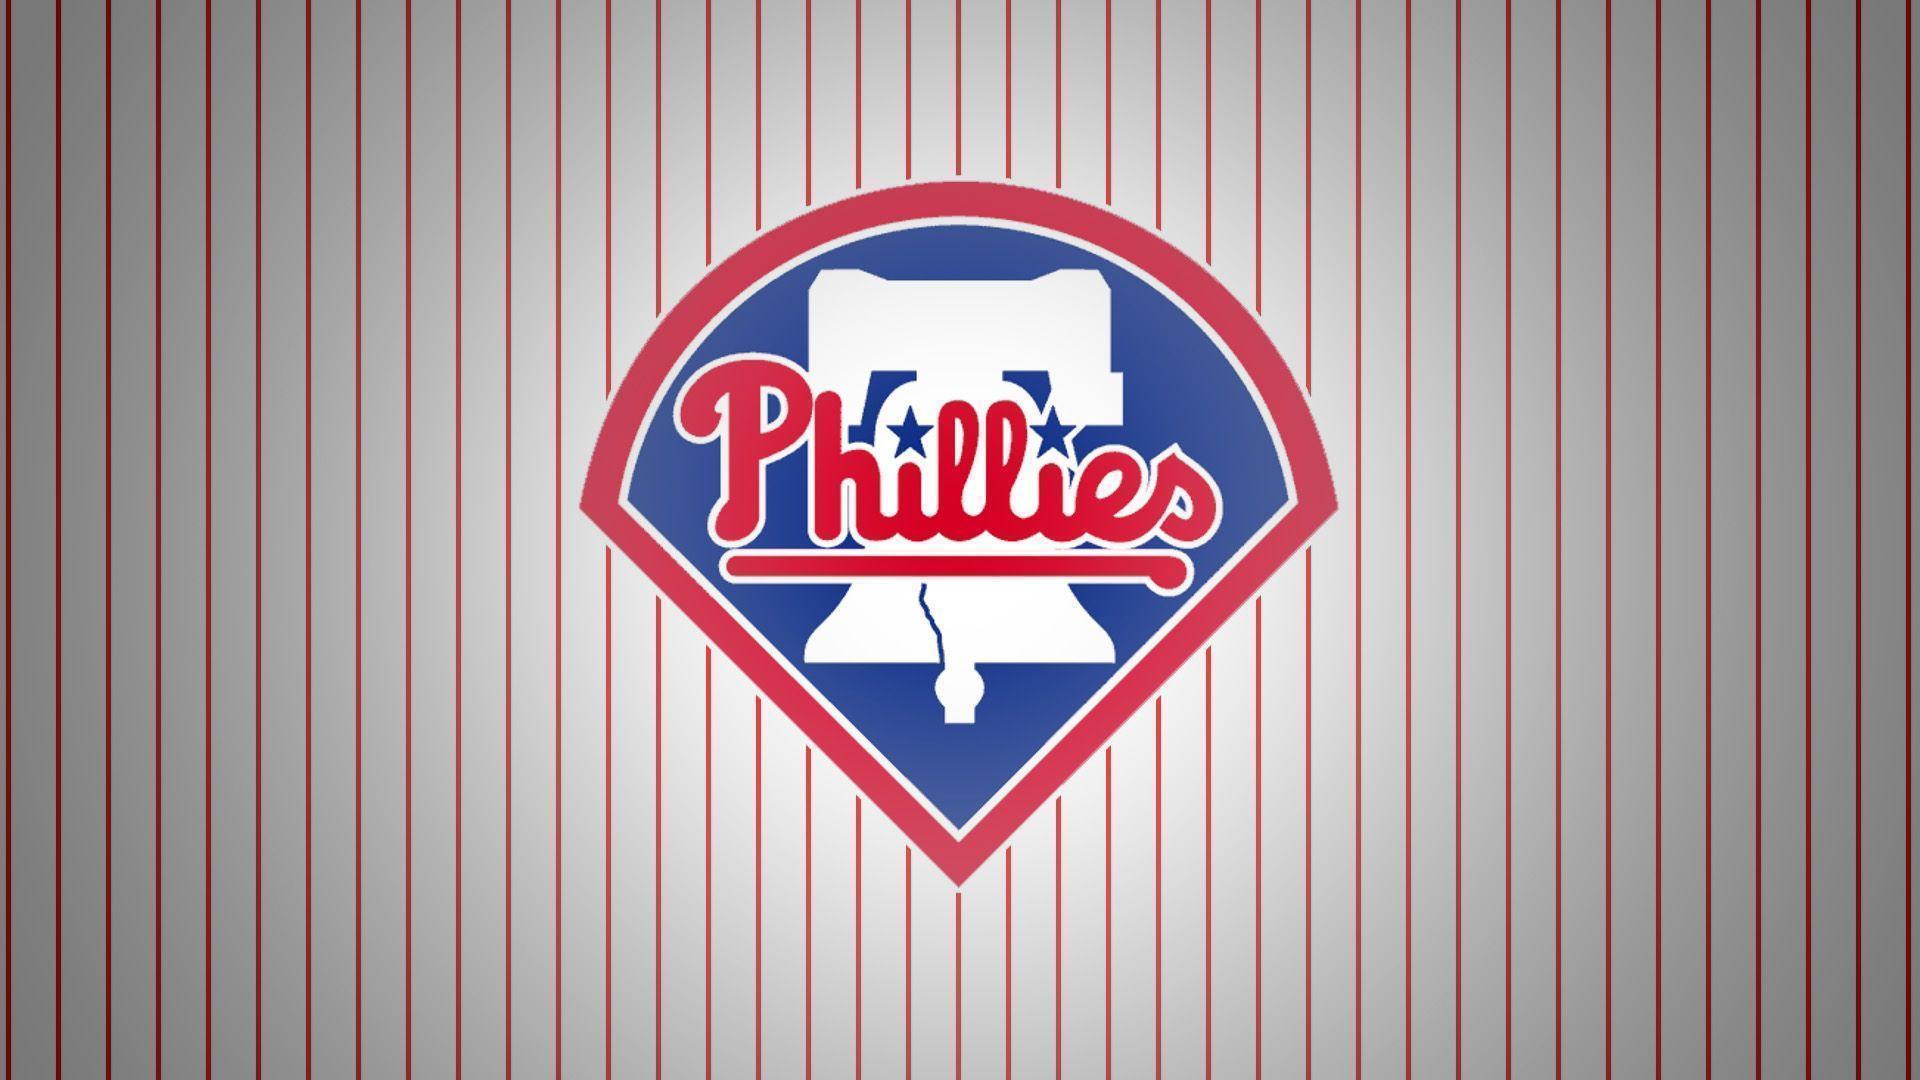 Philadelphia Phillies Wallpapers Wallpaper Cave